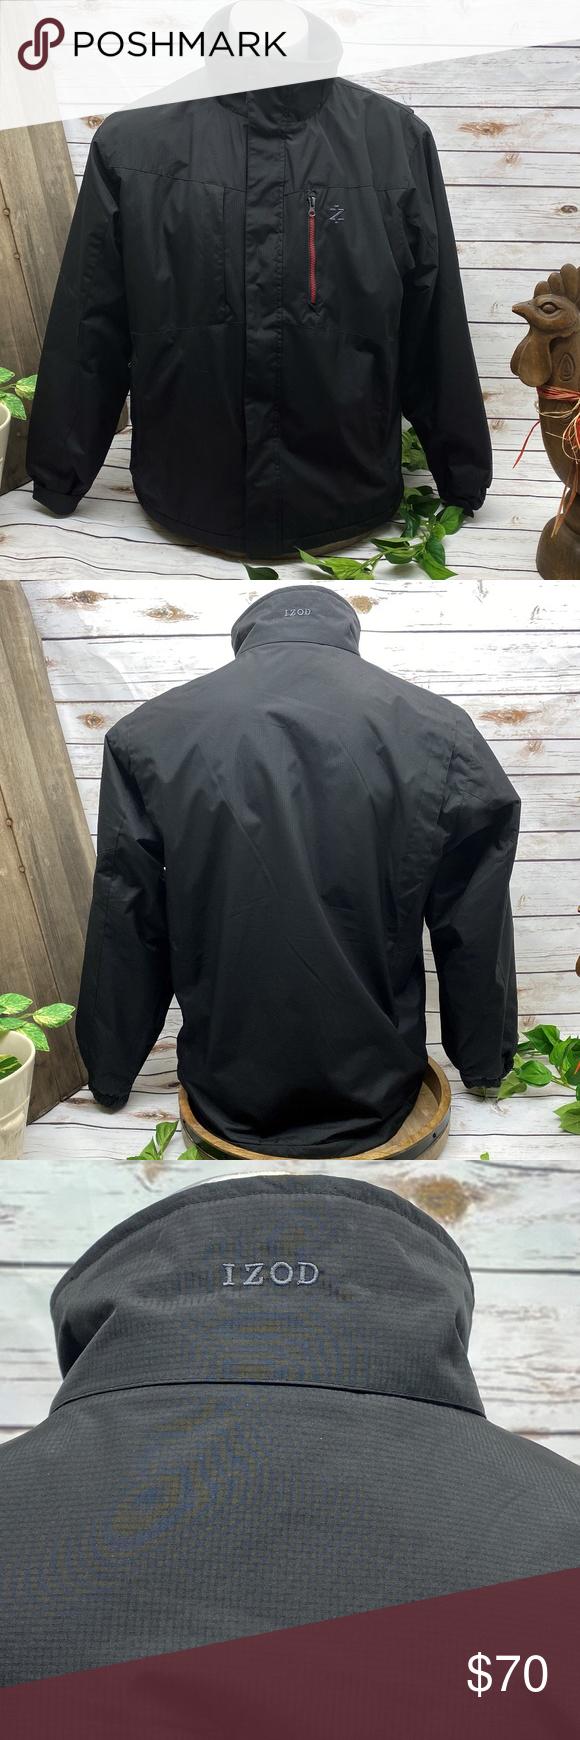 Izod Men S Perform X Jacket Black M Medium Men S Size Medium Izod Perform X Coat Fleece Lined For War Mens Fleece Jacket Wind Resistant Jacket Mens Vest Jacket [ 1740 x 580 Pixel ]